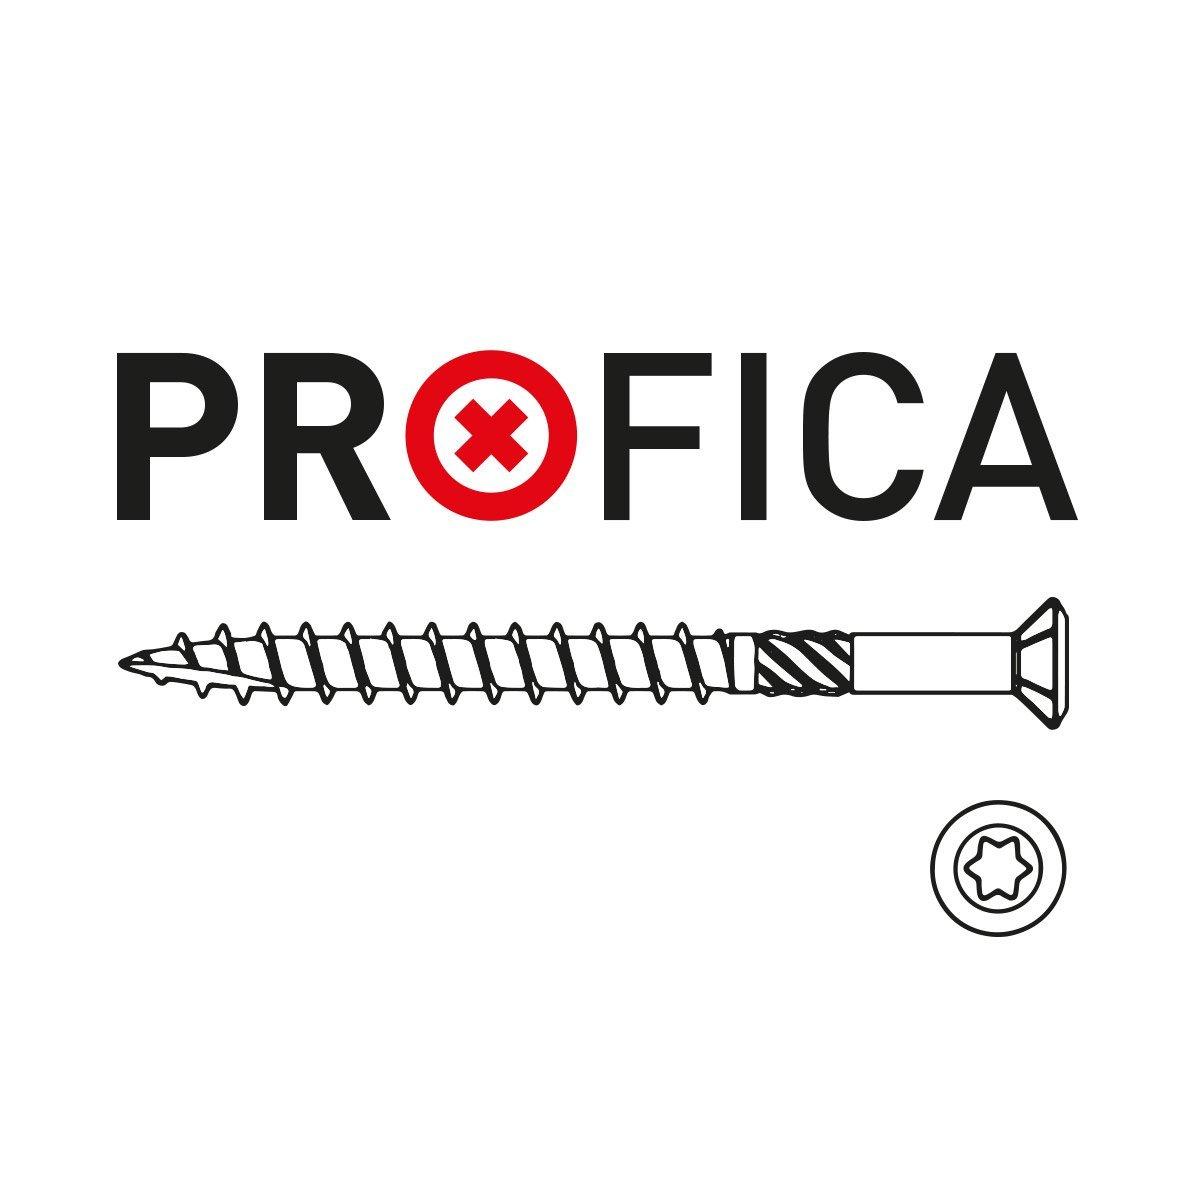 Terrassenschrauben Edelstahl C1 5x60mm inkl 100 PROFICA PROFICA Edelstahl Bit Torx 25 VA